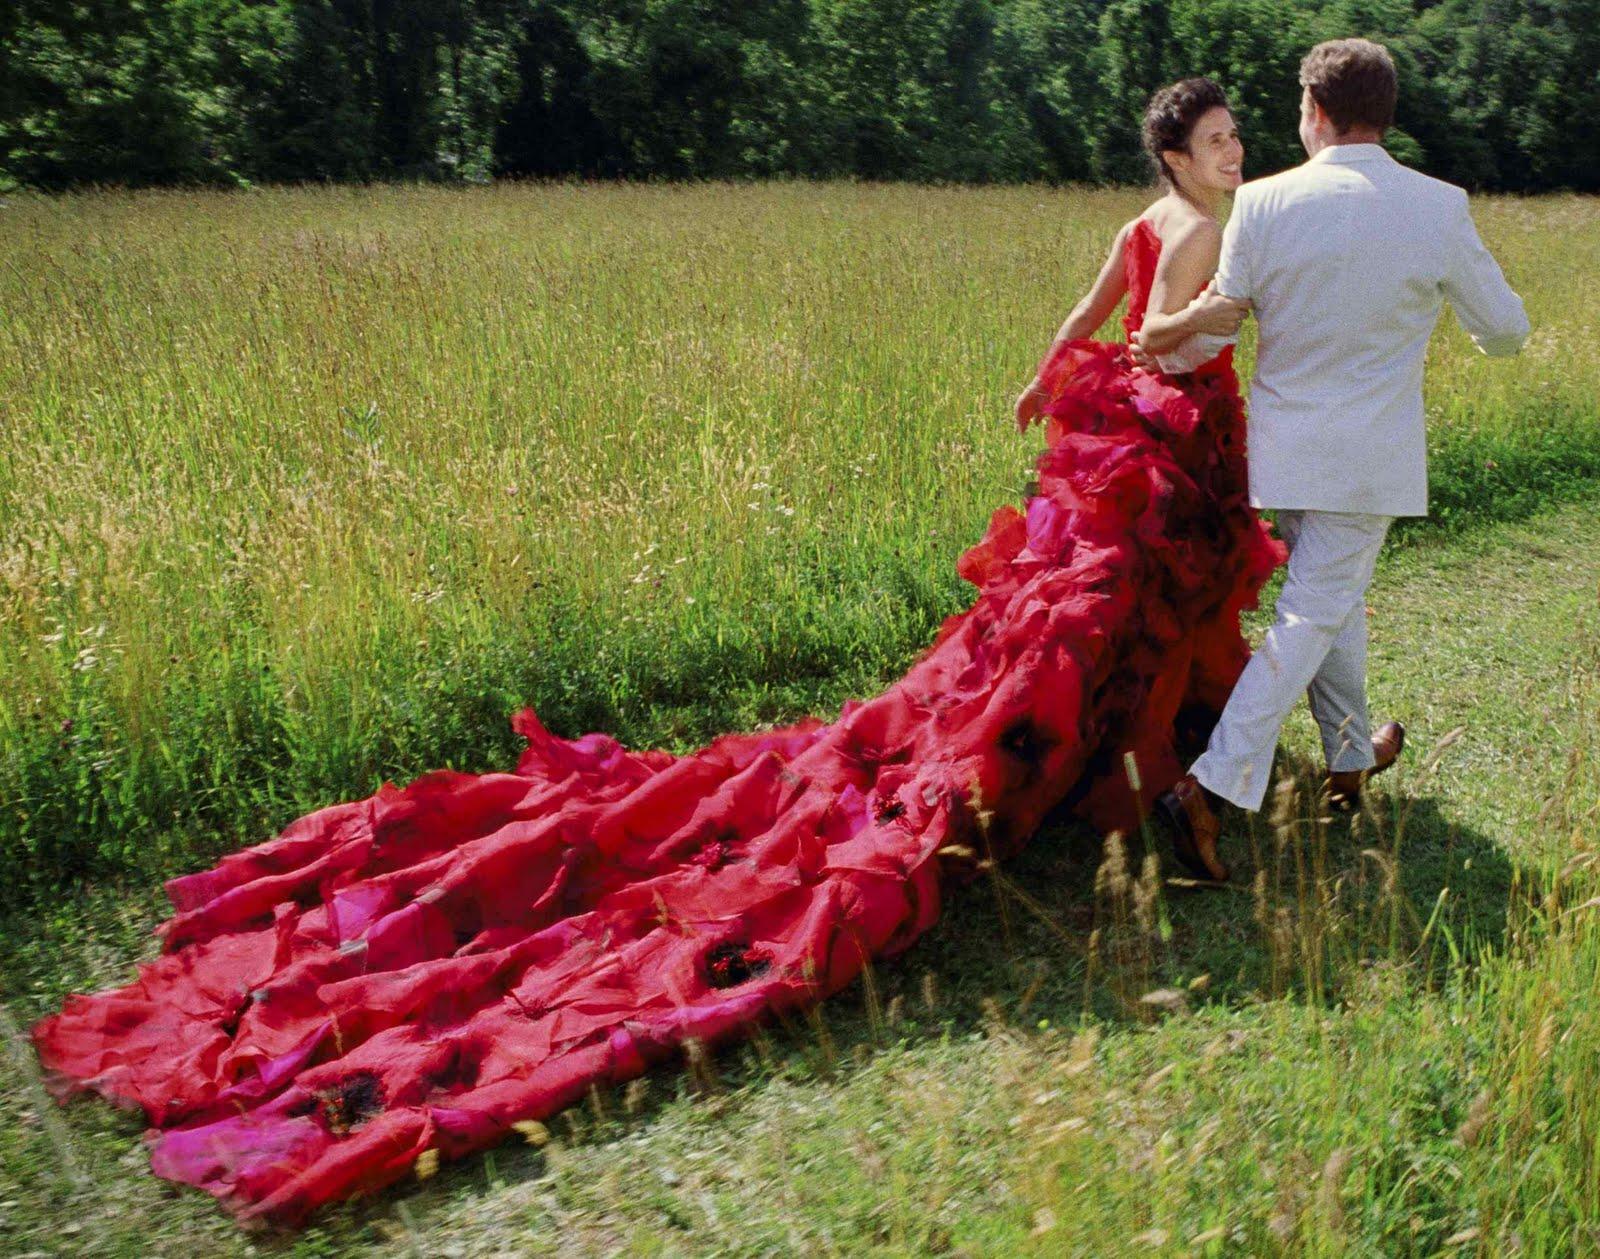 zac posen wedding dresses zac posen wedding dresses zac posen designed dress for his wedding